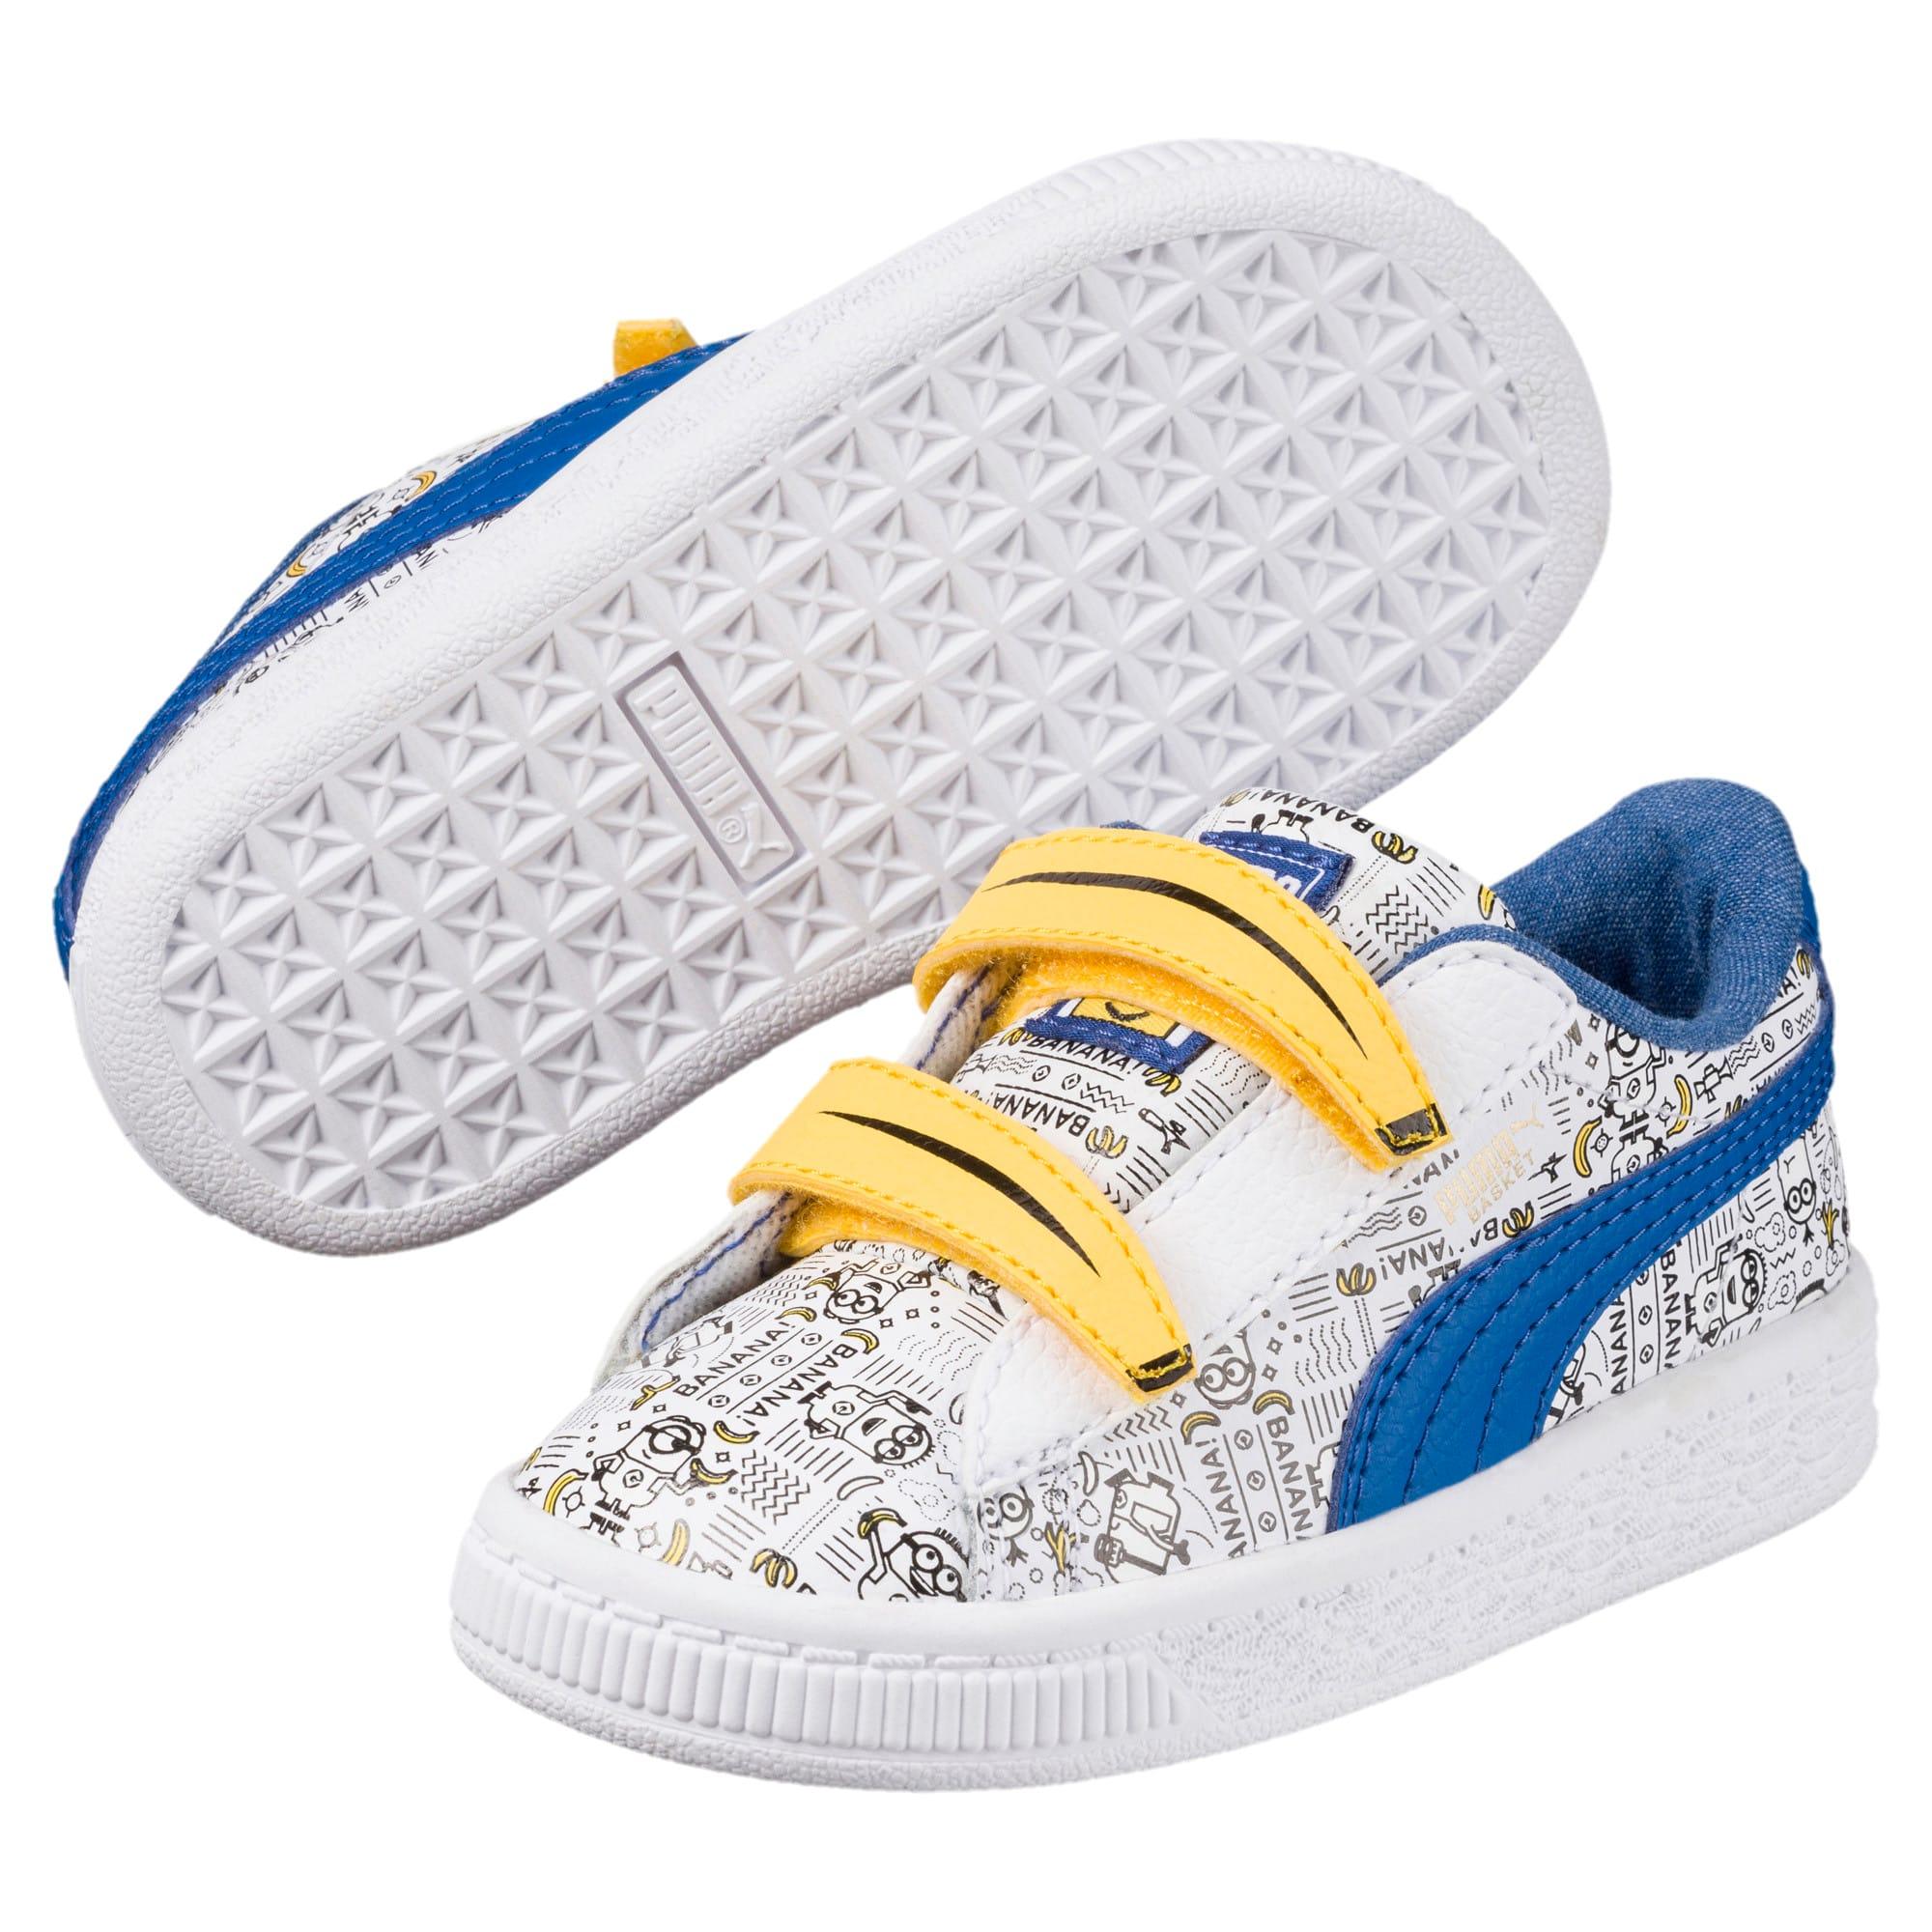 Thumbnail 2 of Minions Basket Little Kids' Shoes, Puma White-Lapis Blue, medium